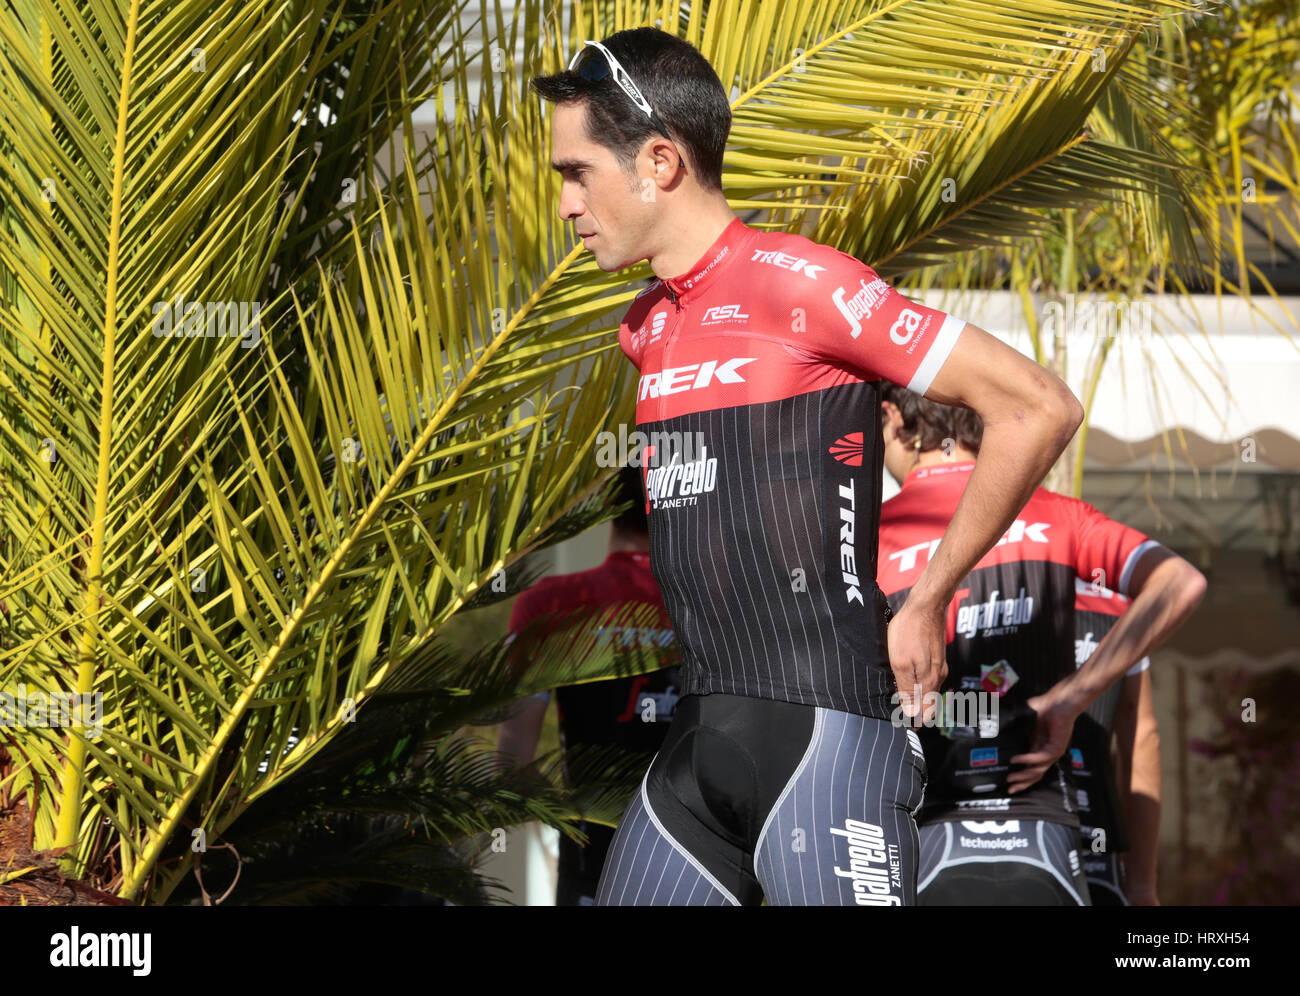 1e5f897ff Alberto Contador pose with his new team jersey Trek Segafredo before a training  session in the